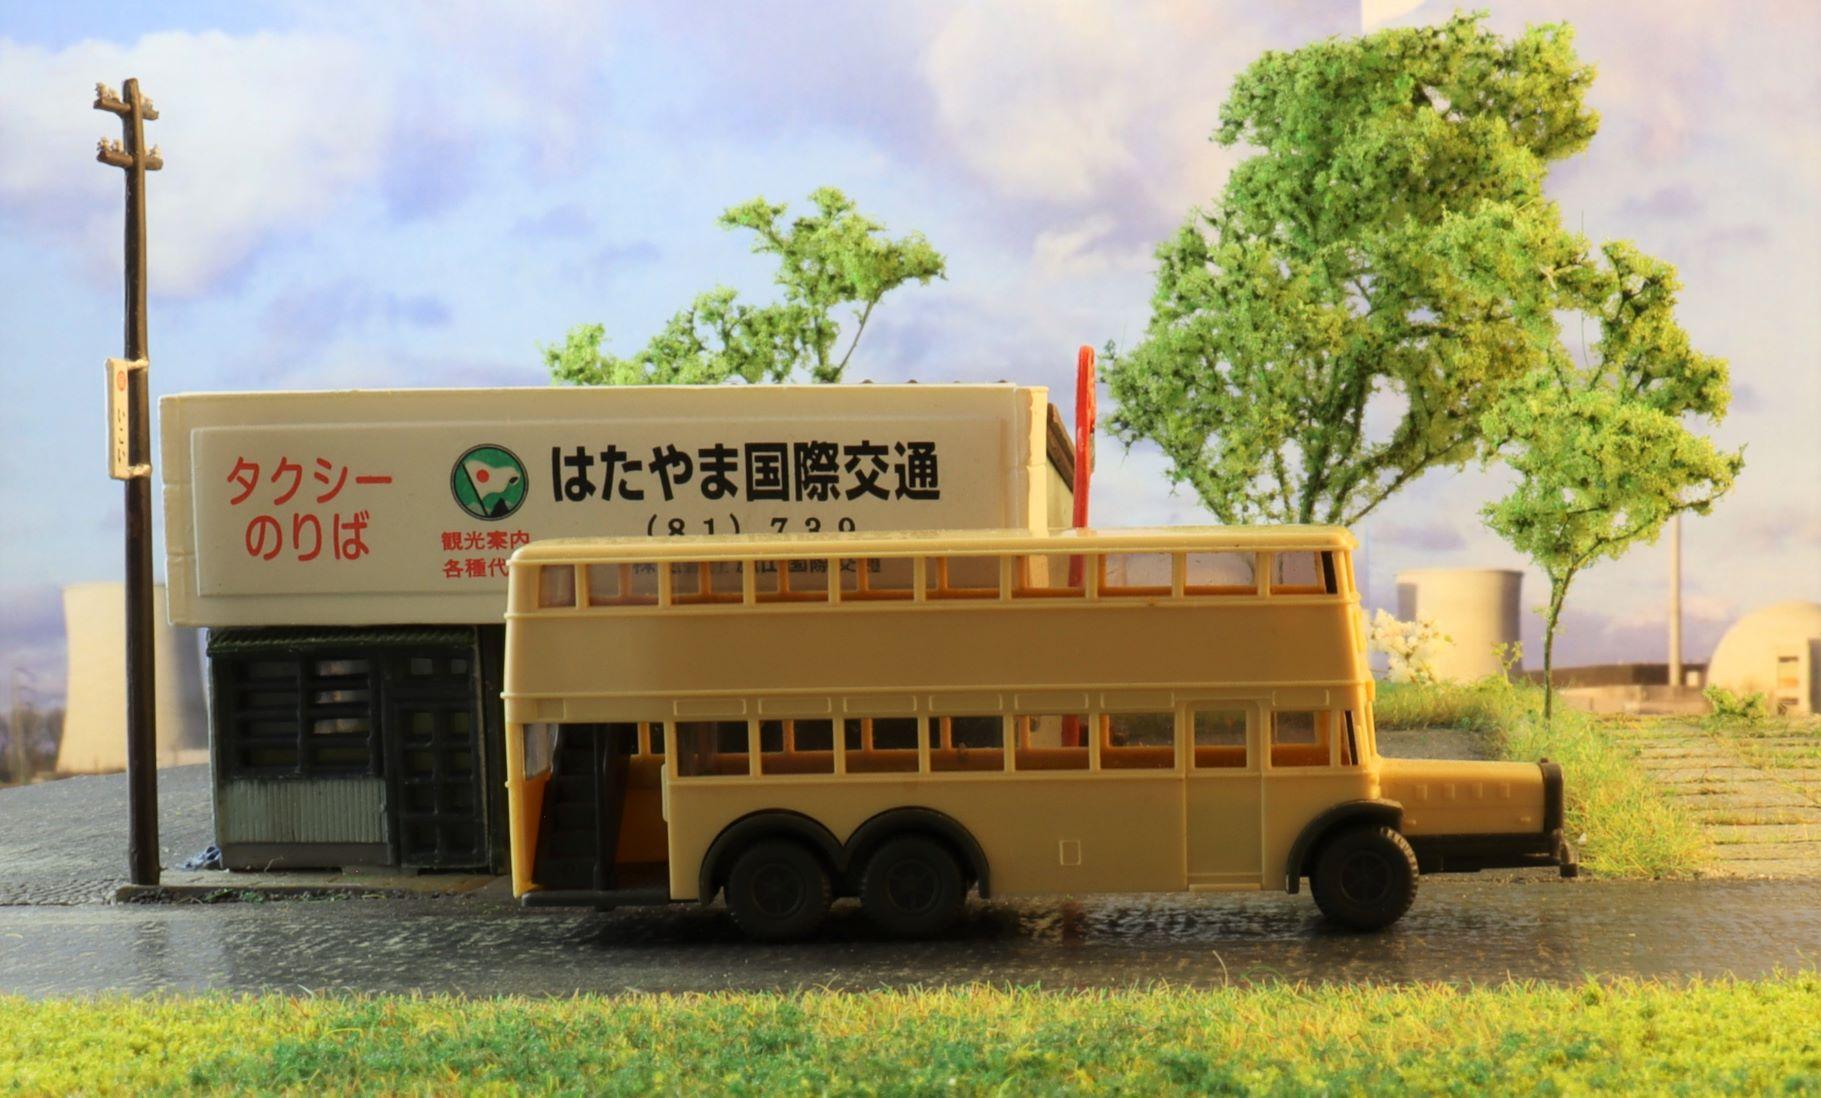 Bussing Autobus 1 .JPG